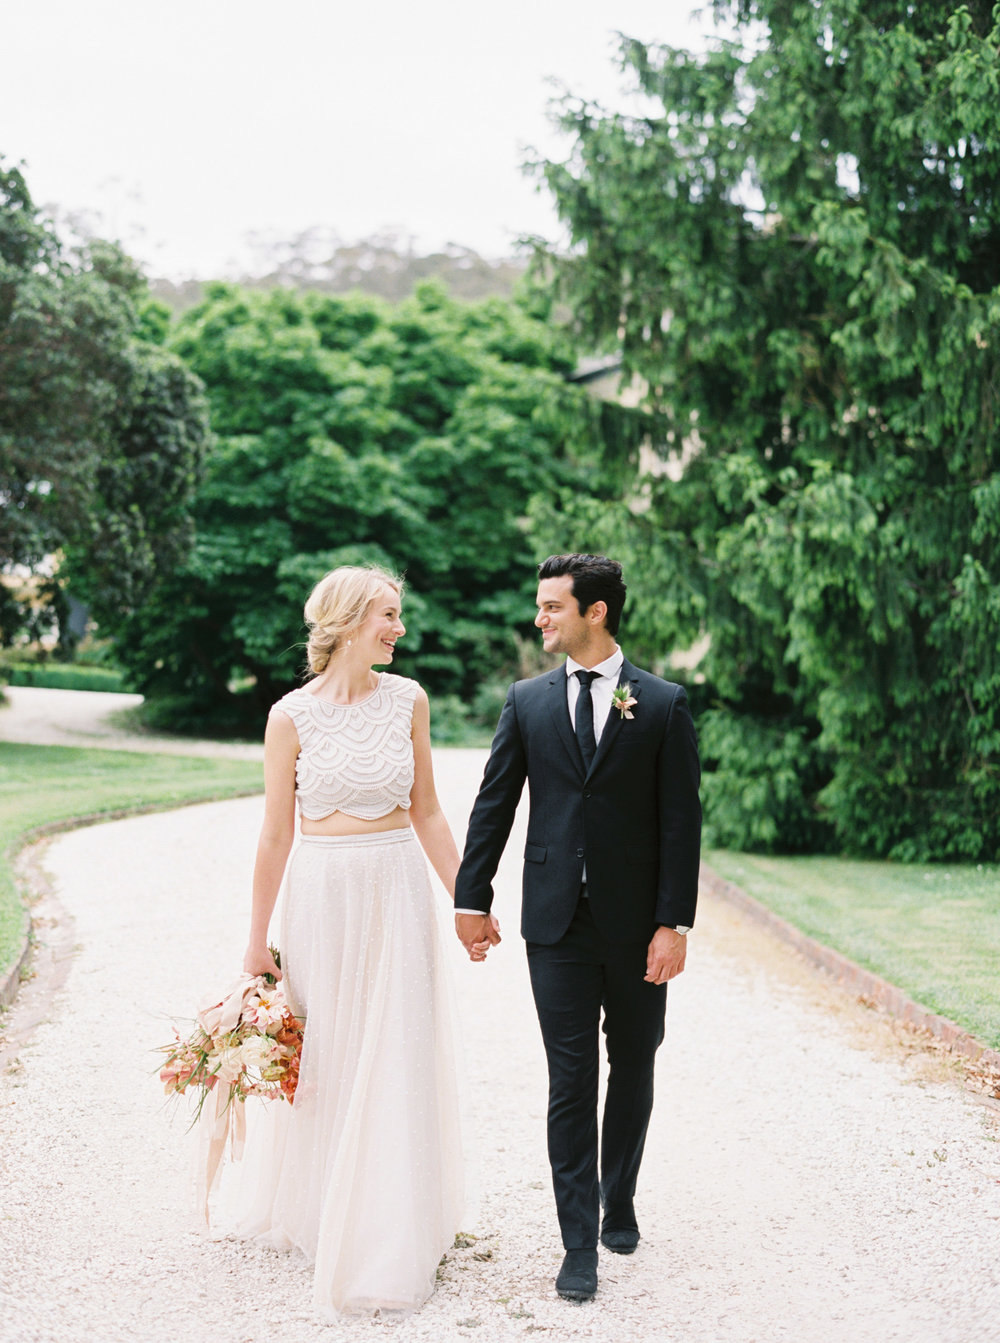 Timeless Southern Highland Wedding Elopement in Bowral NSW Fine Art Film Photographer Sheri McMahon-33.jpg